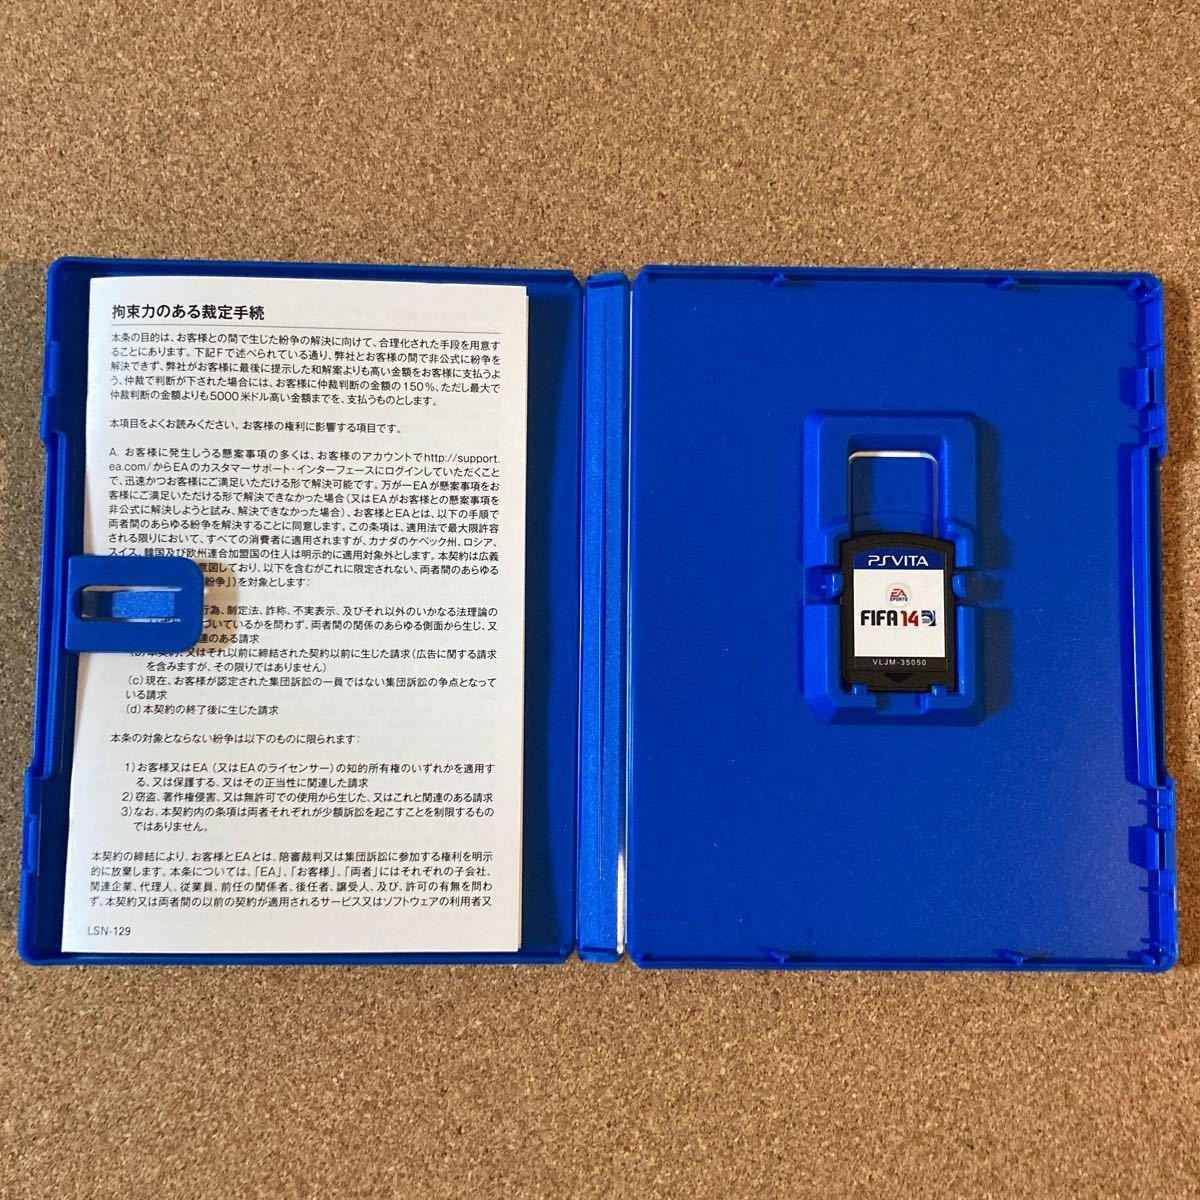 PS Vitaソフト4本